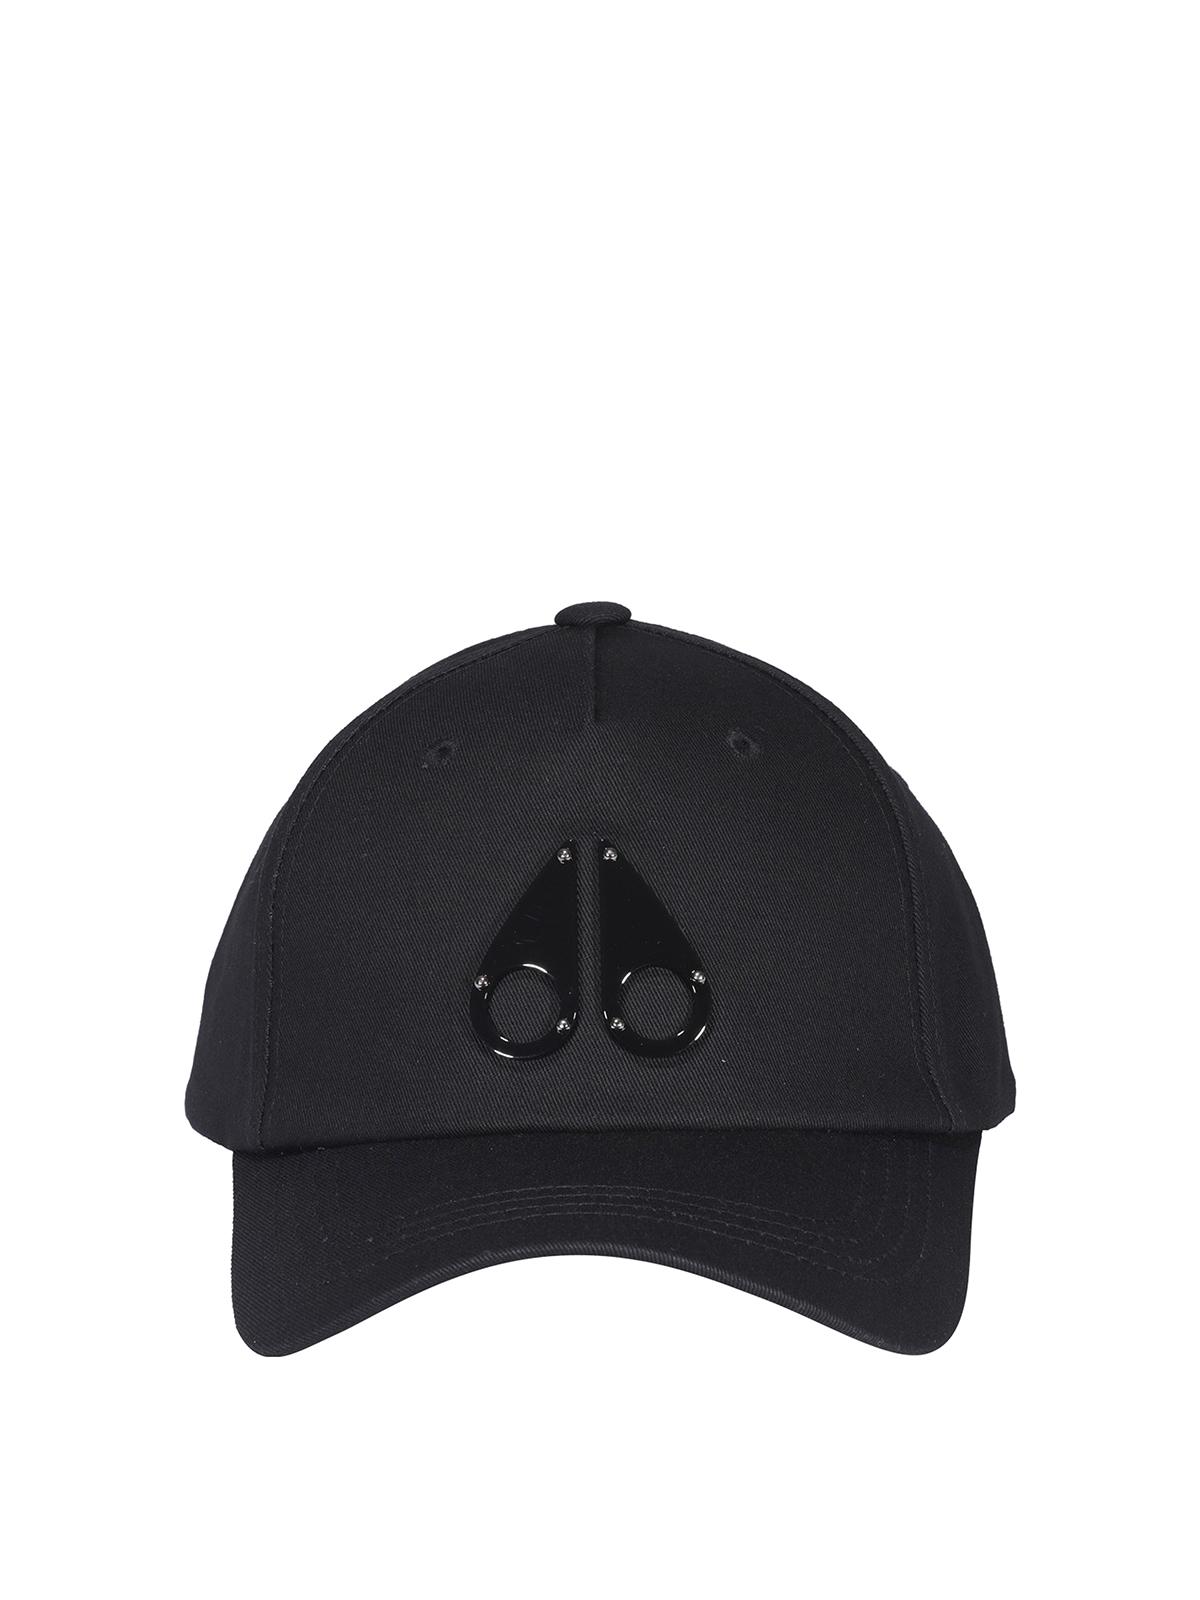 Moose Knuckles Caps COTTON BASEBALL CAP